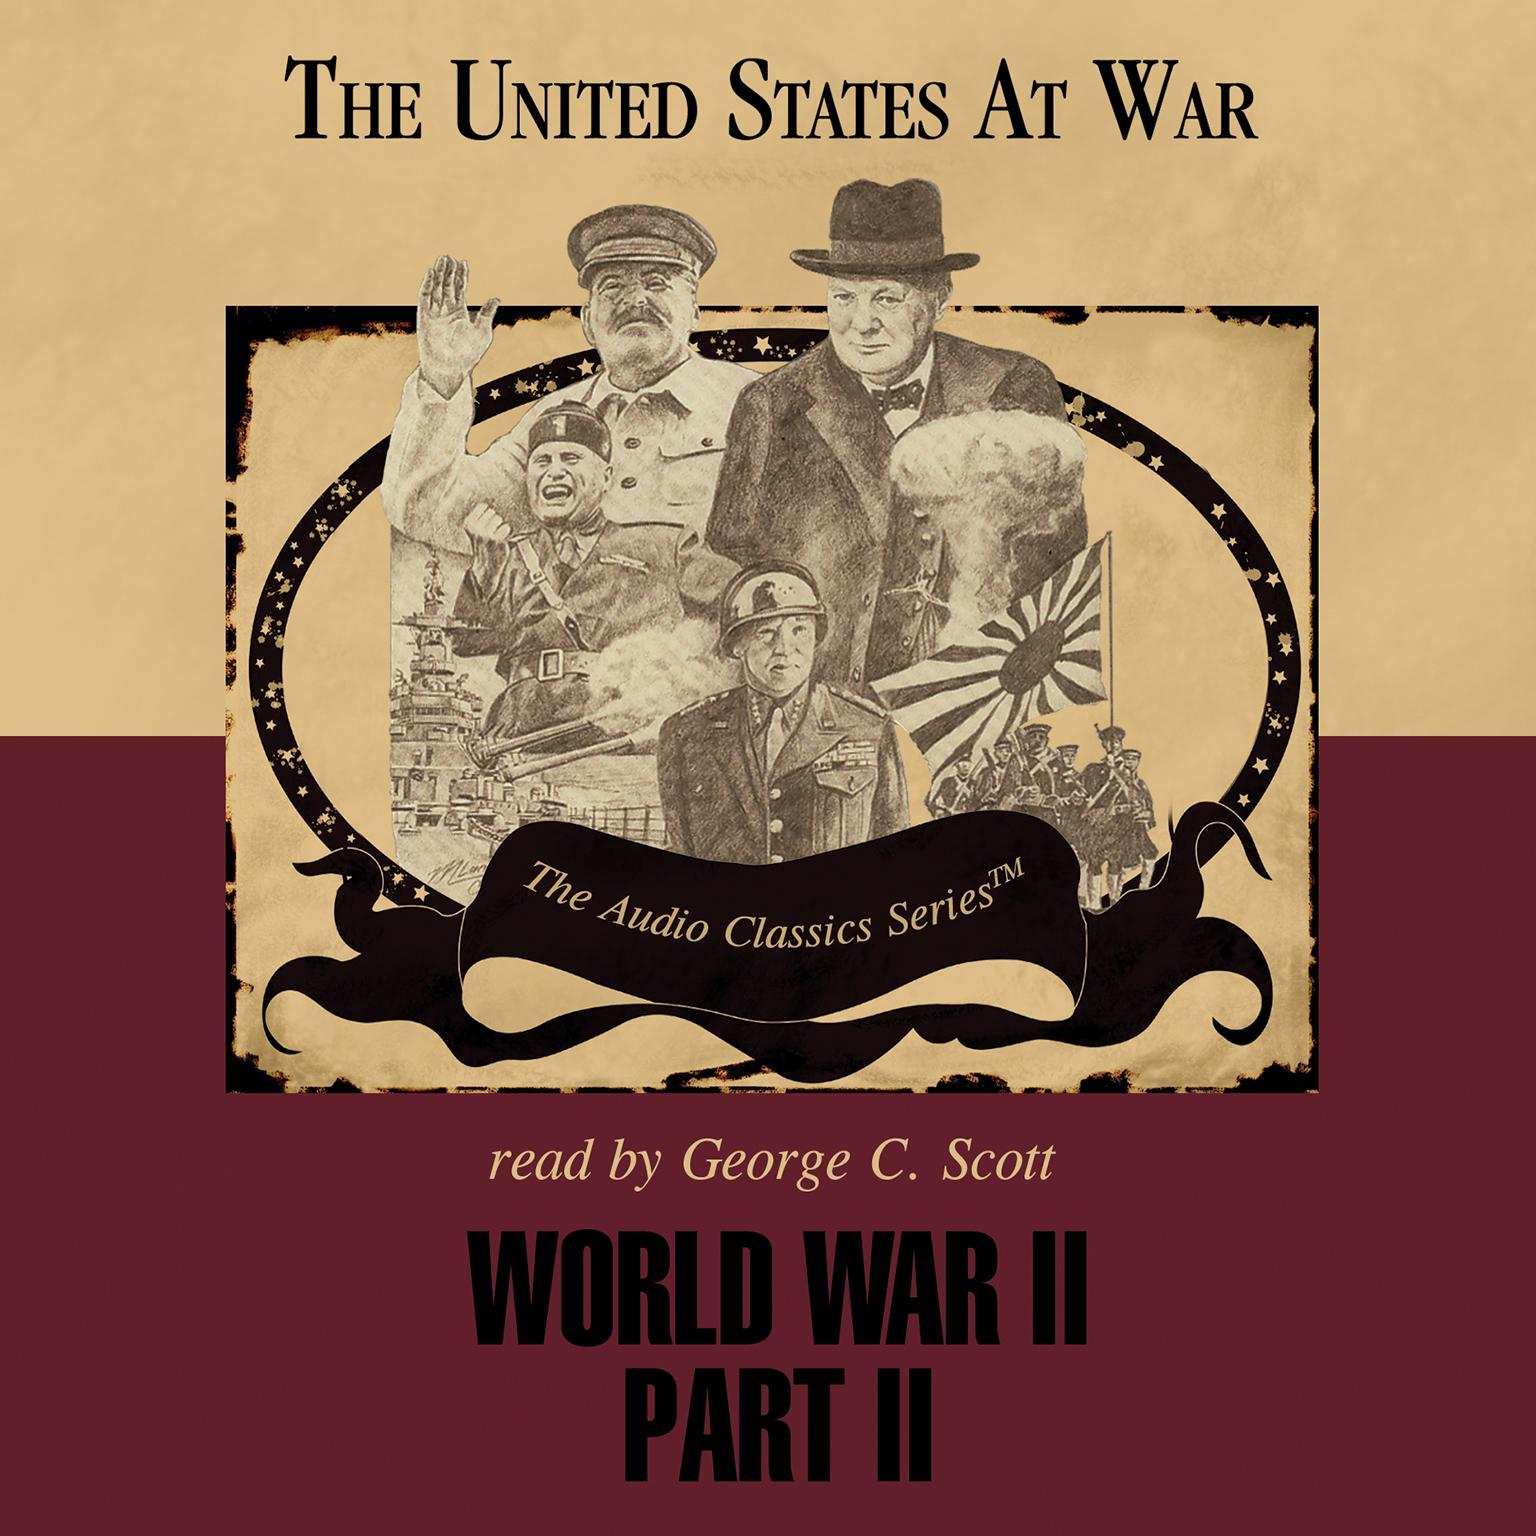 World War II, Part 2 Audiobook, by Joseph Stromberg